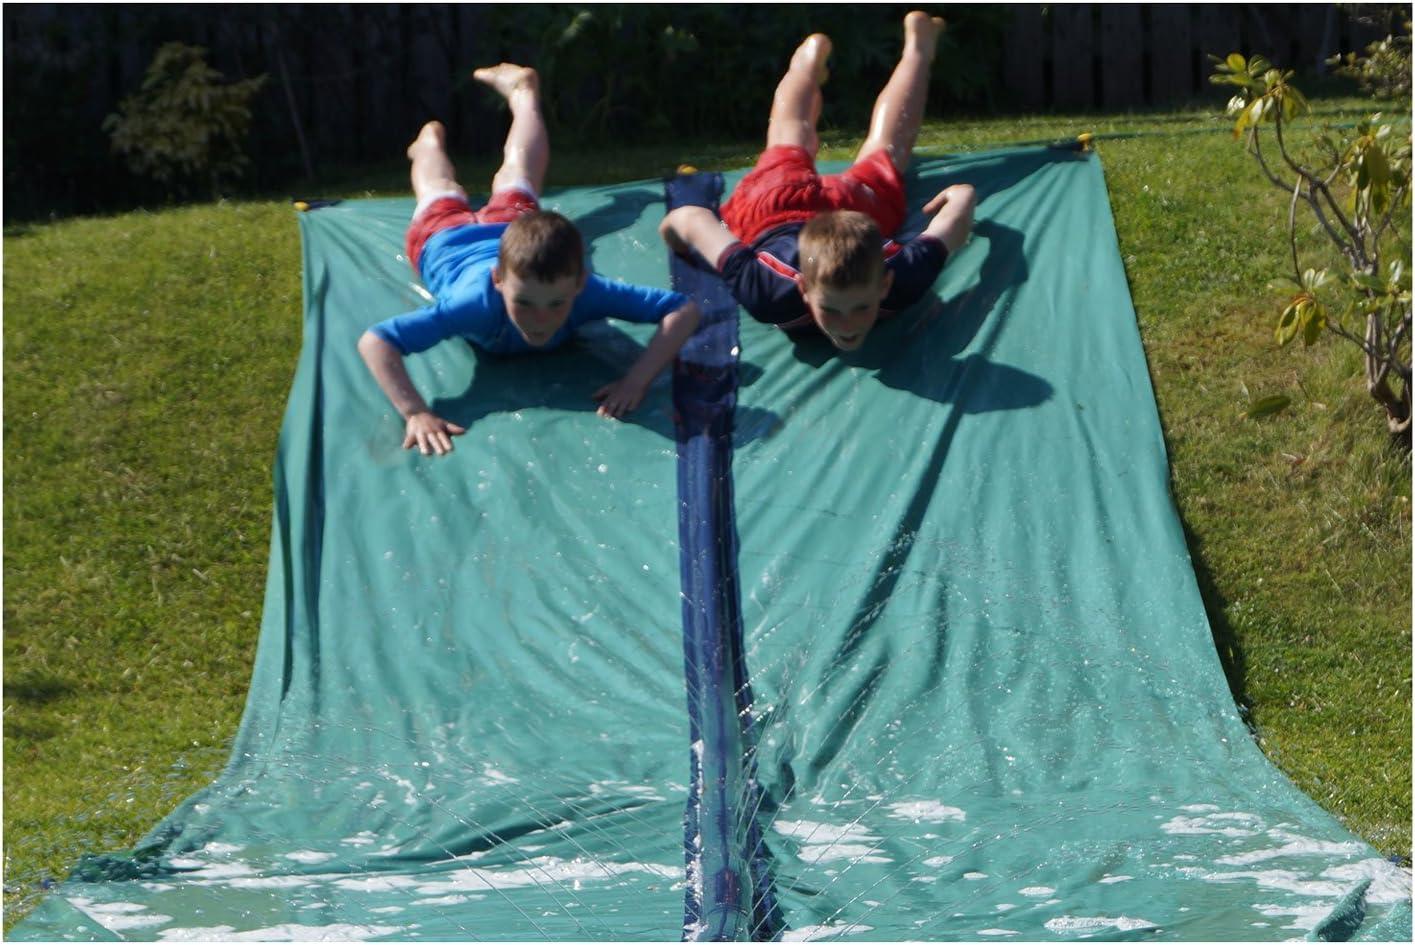 Water Slide for Garden Play 31 Foot Slip and Slide for Races